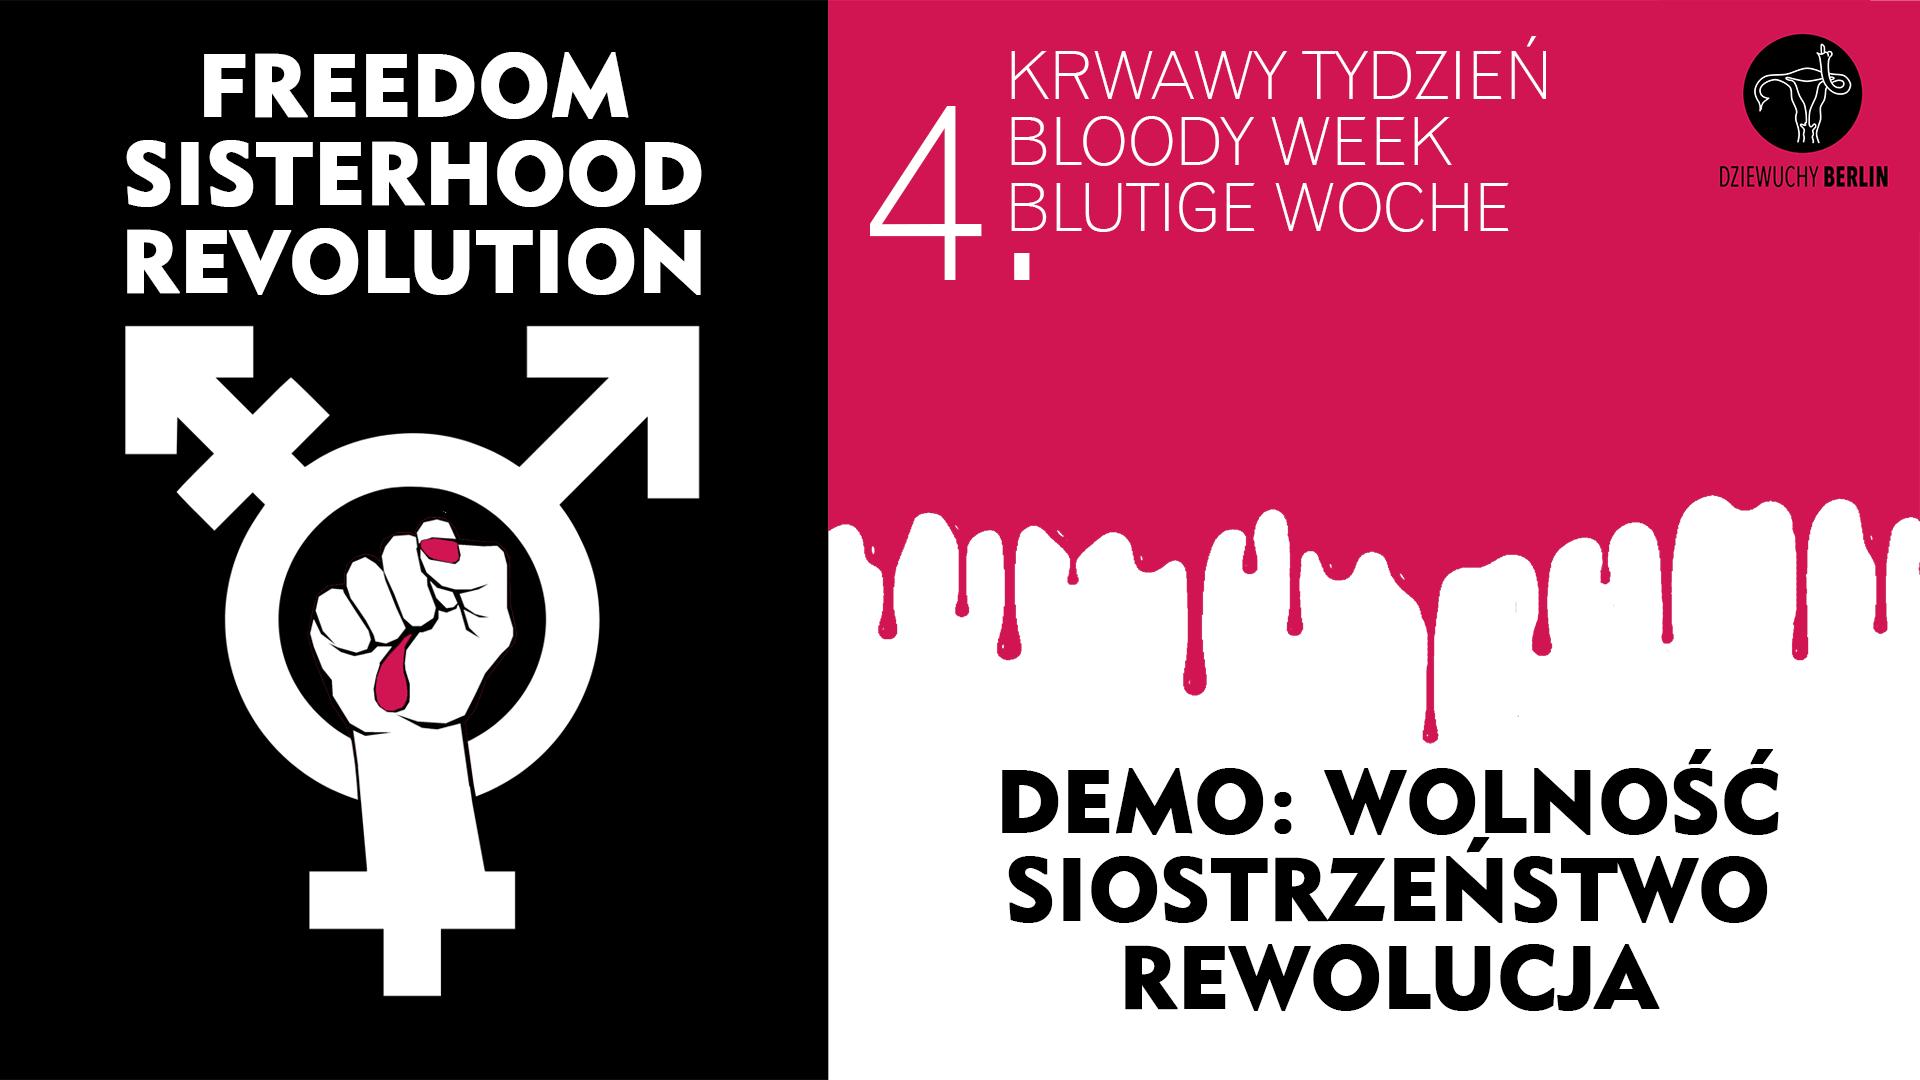 19.11.2020 DEMO: FREEDOM, SISTERHOOD, REVOLUTION